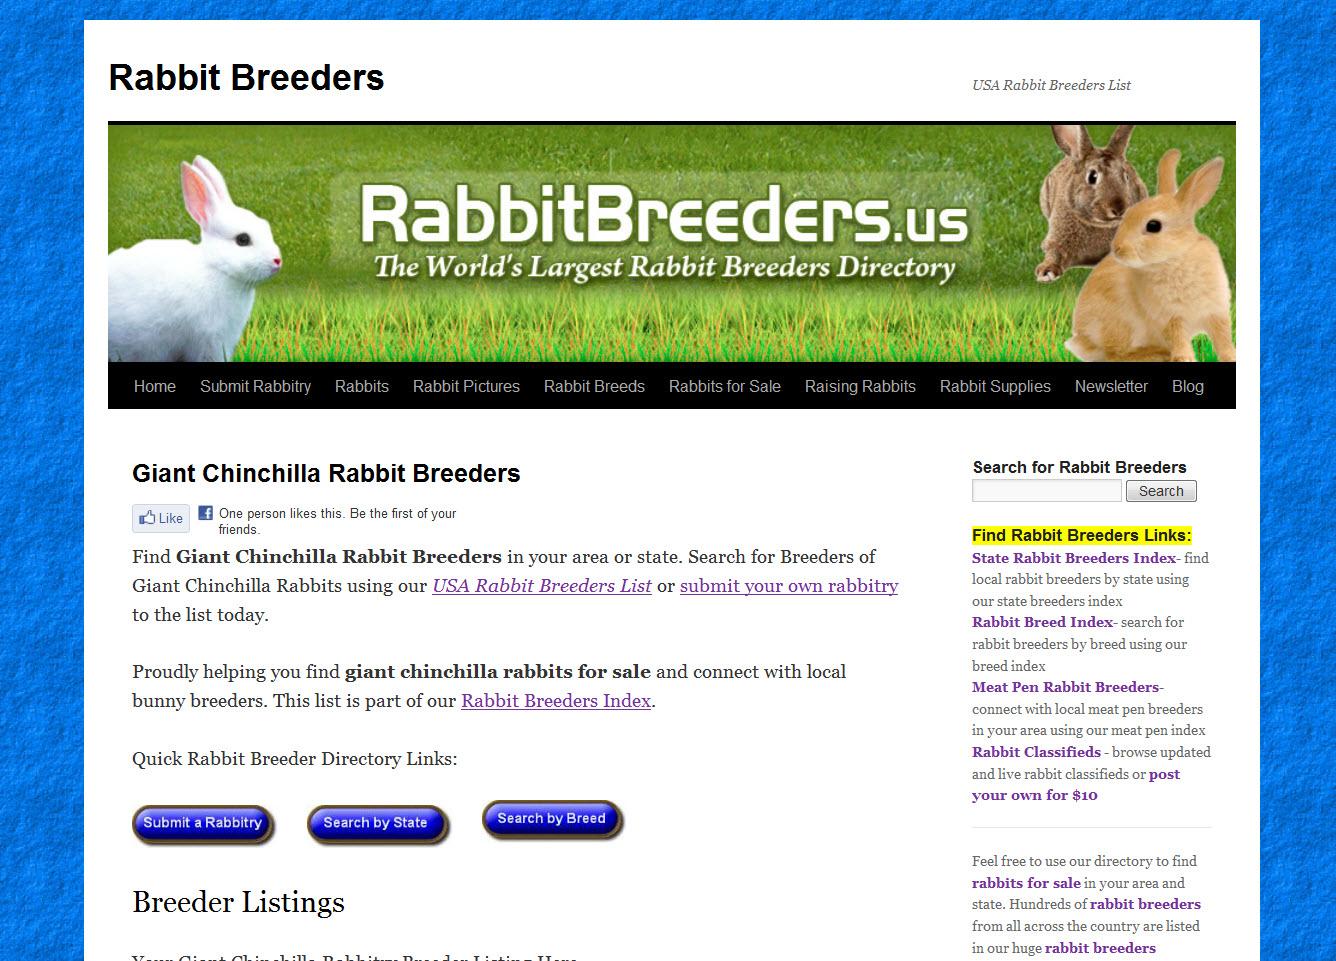 Giant Chinchilla Rabbits for Sale